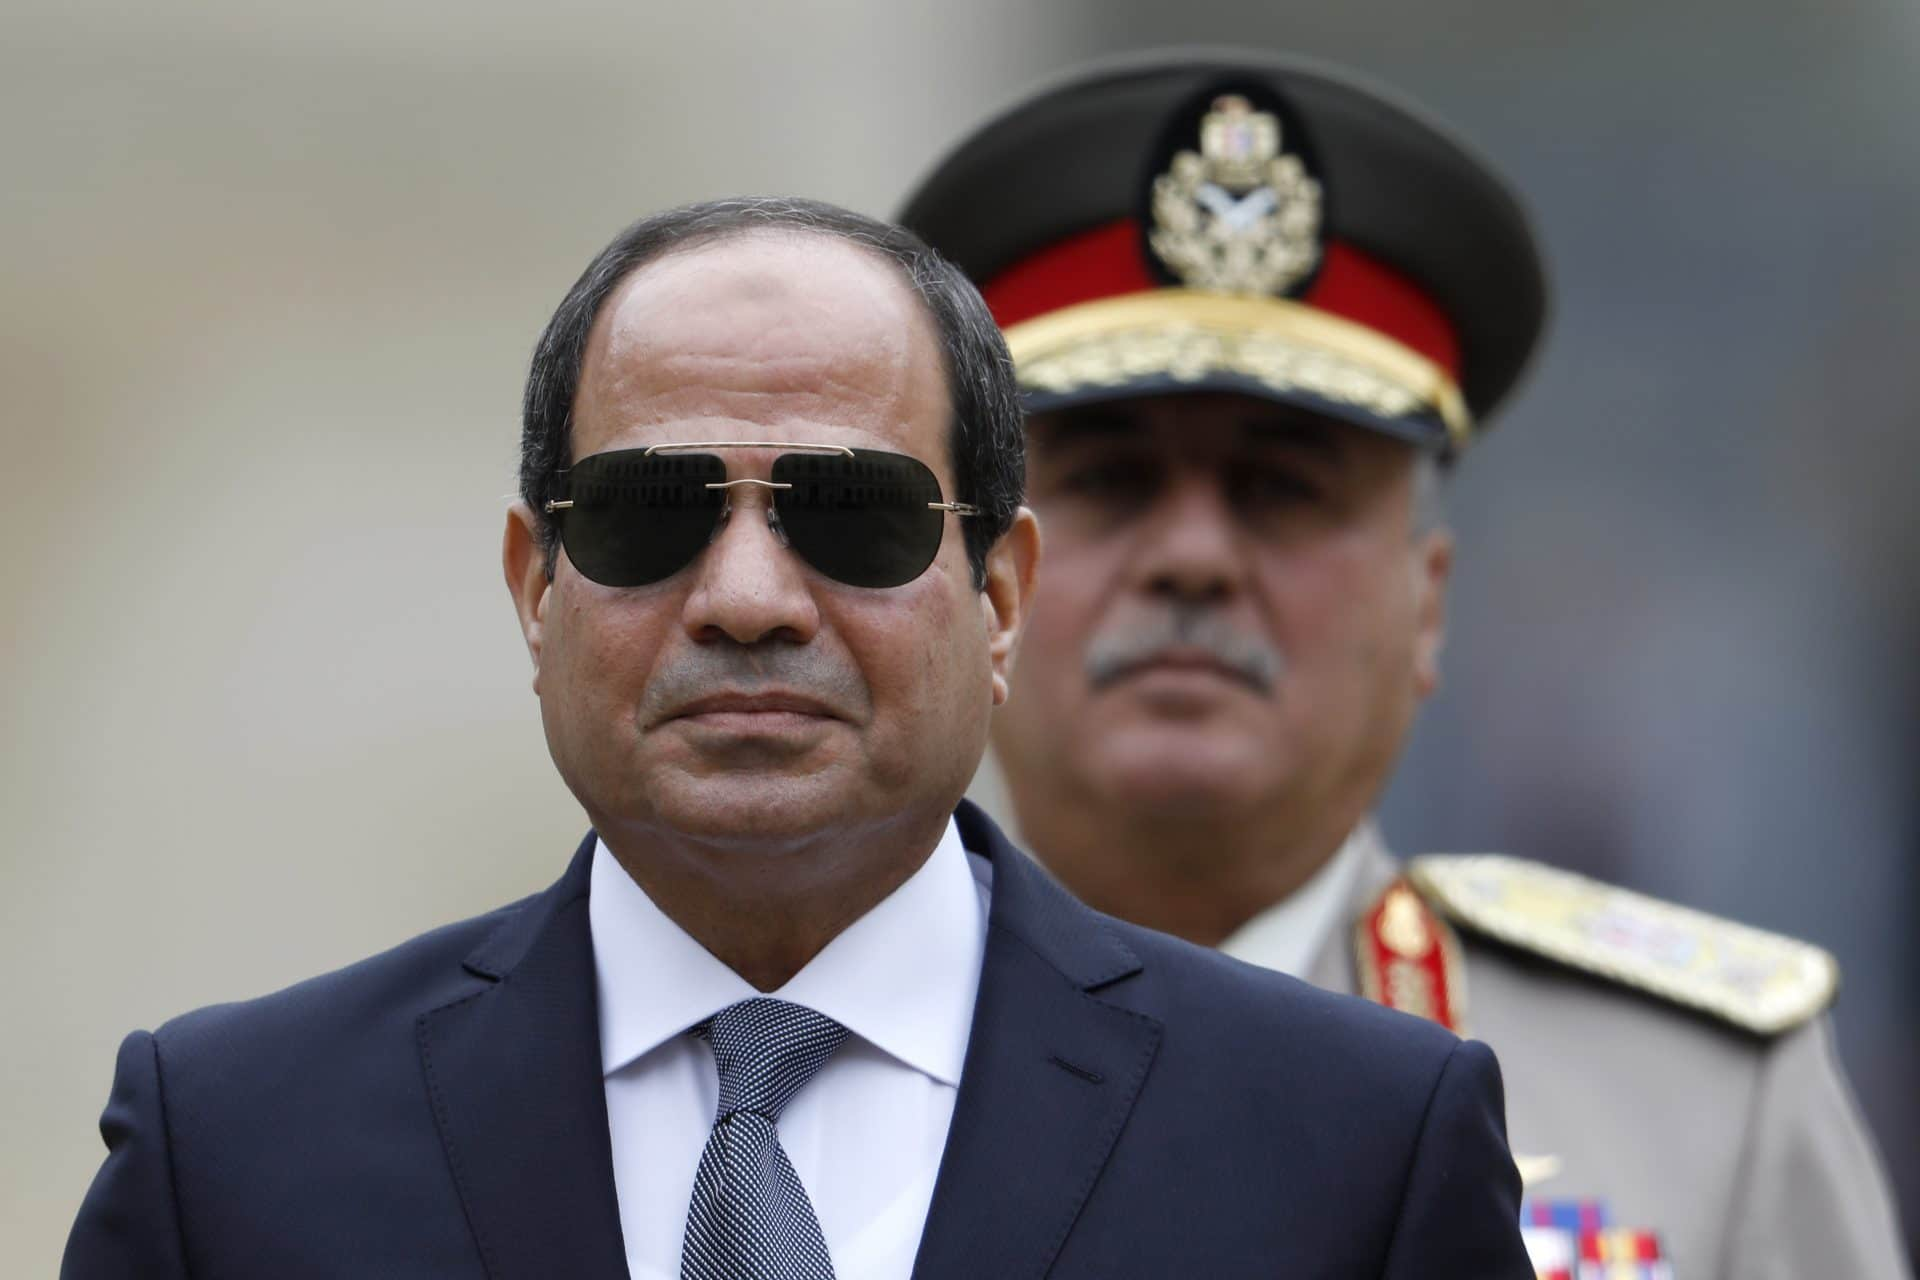 Egitto: uno Stato ereditario